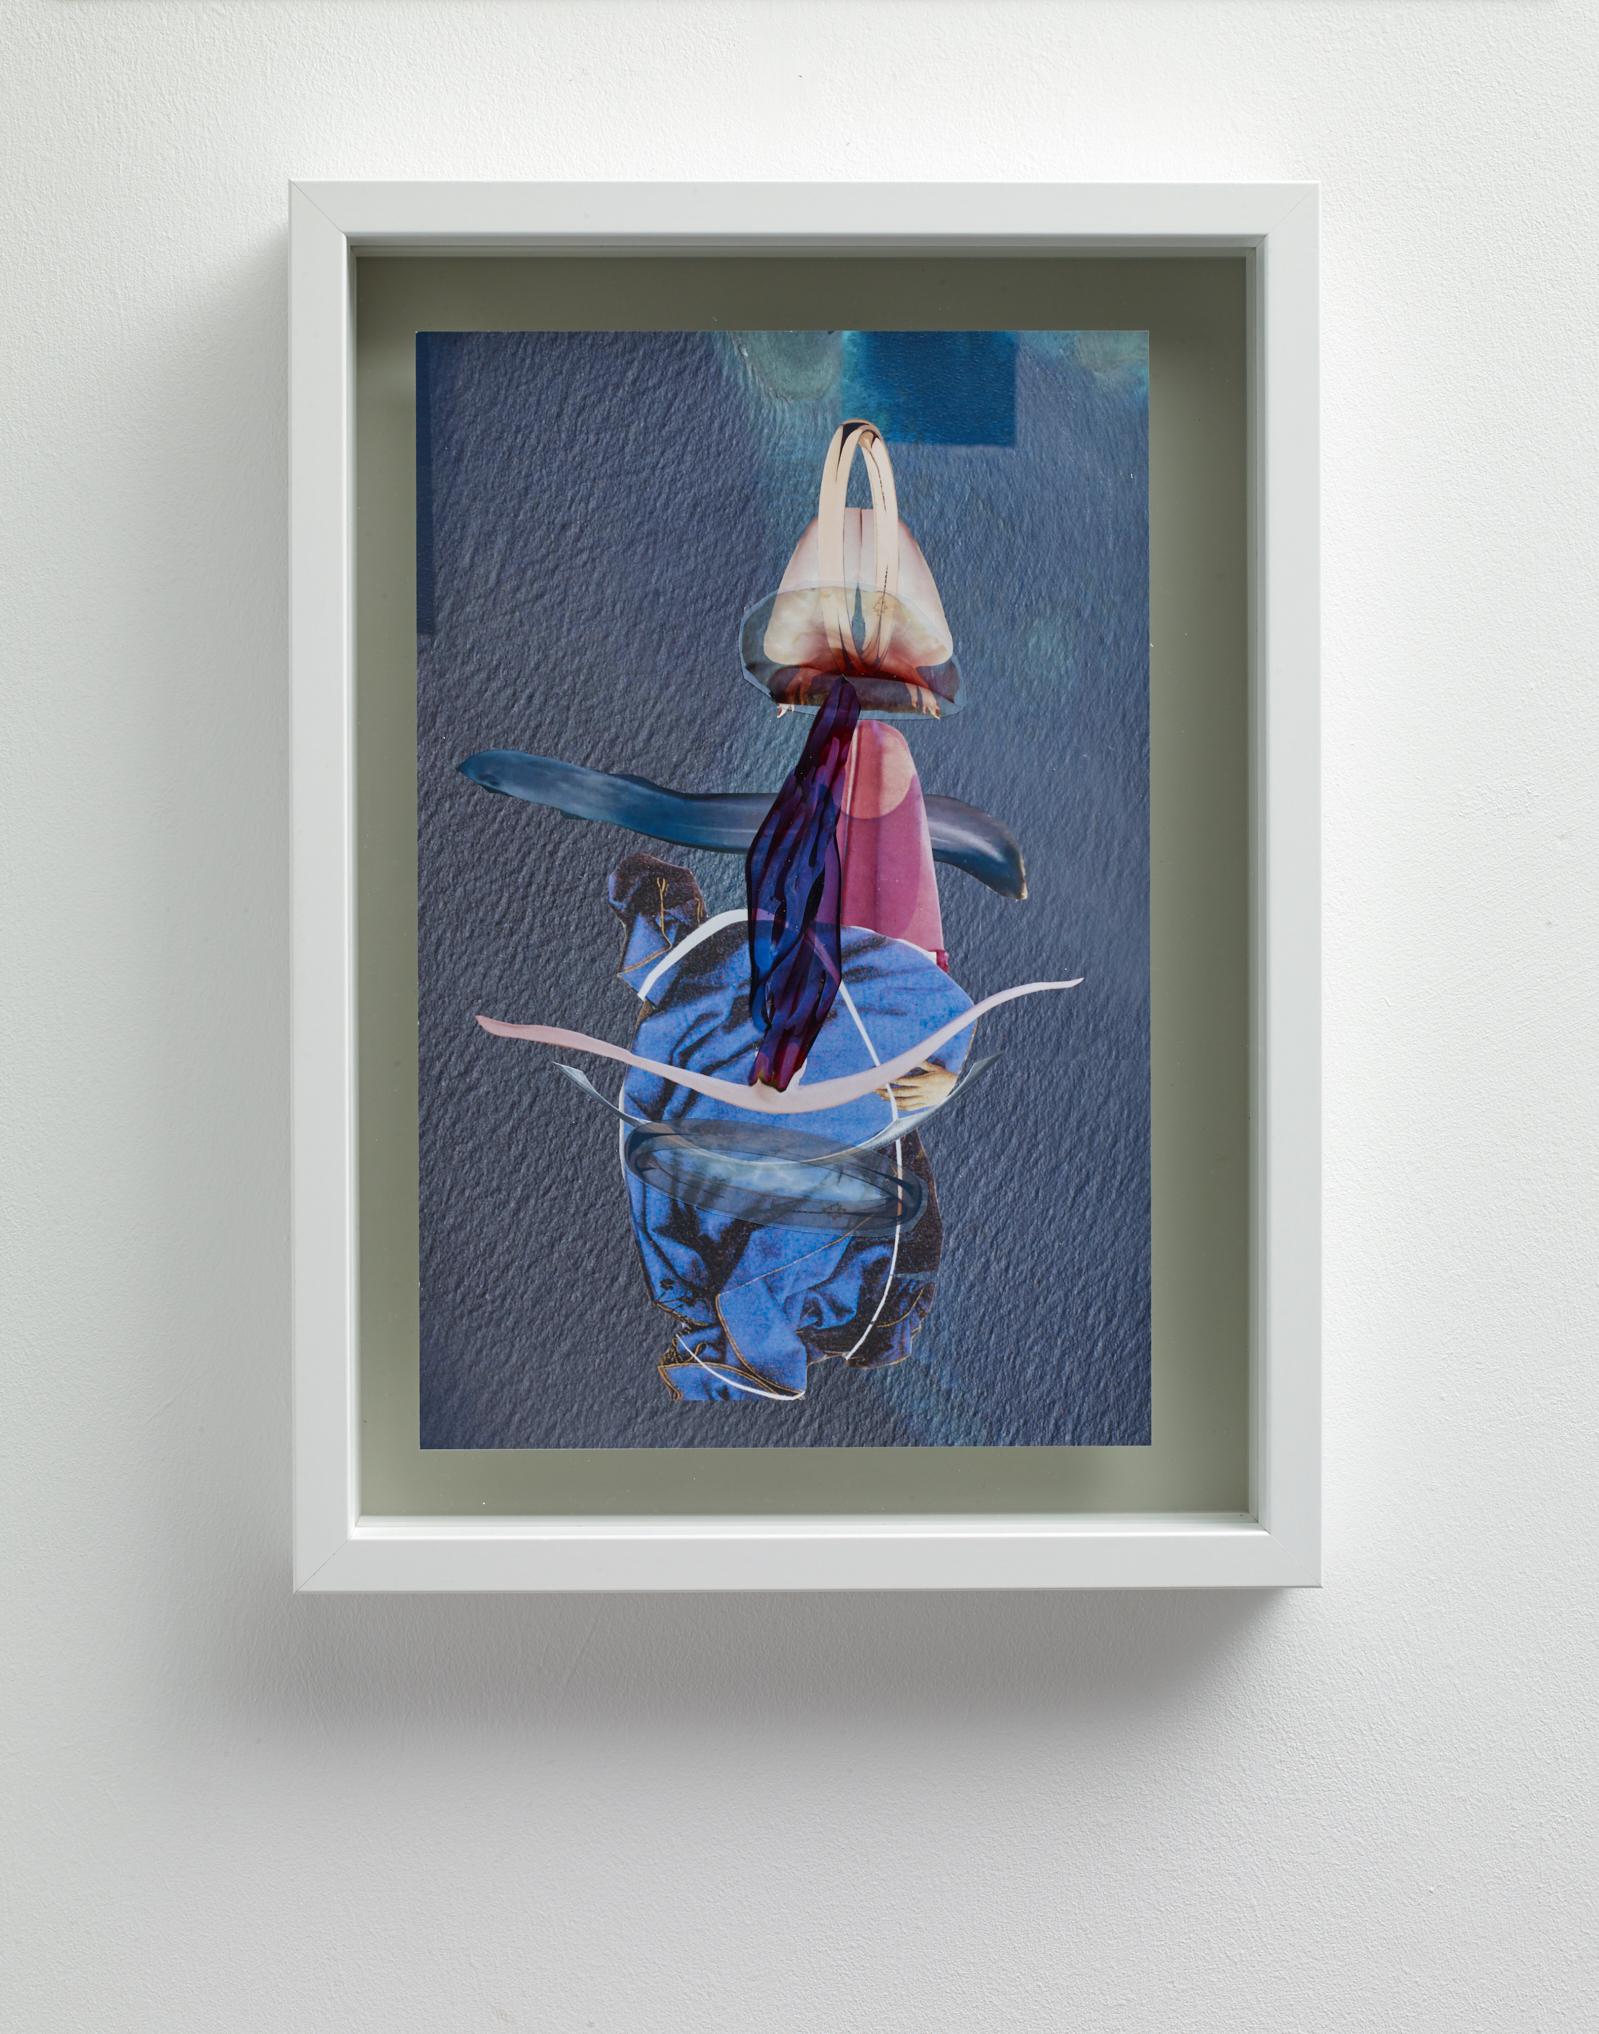 Miriam Austin  We were never under the same water,  2019 Mixed media collage 29.7 x 21 cm